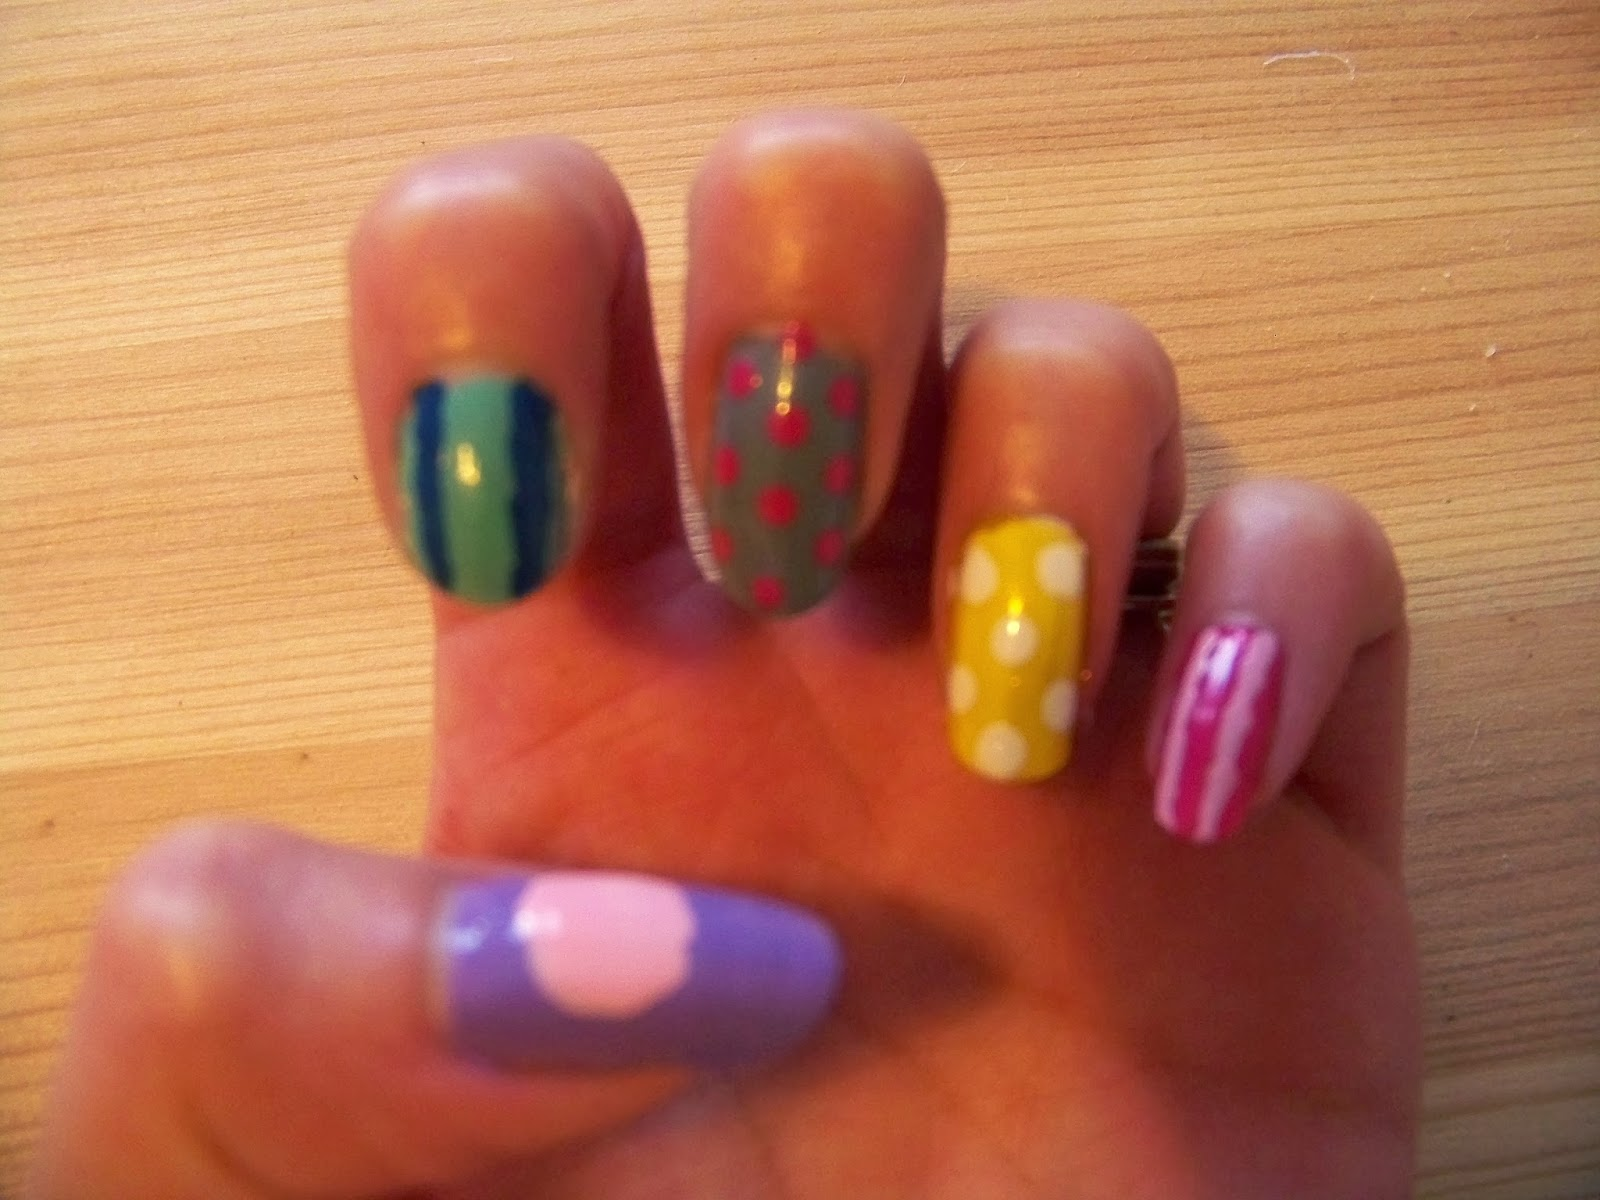 Kyary Pamyu Pamyu PonPonPon Inspired Nails | Yedith and Edgar